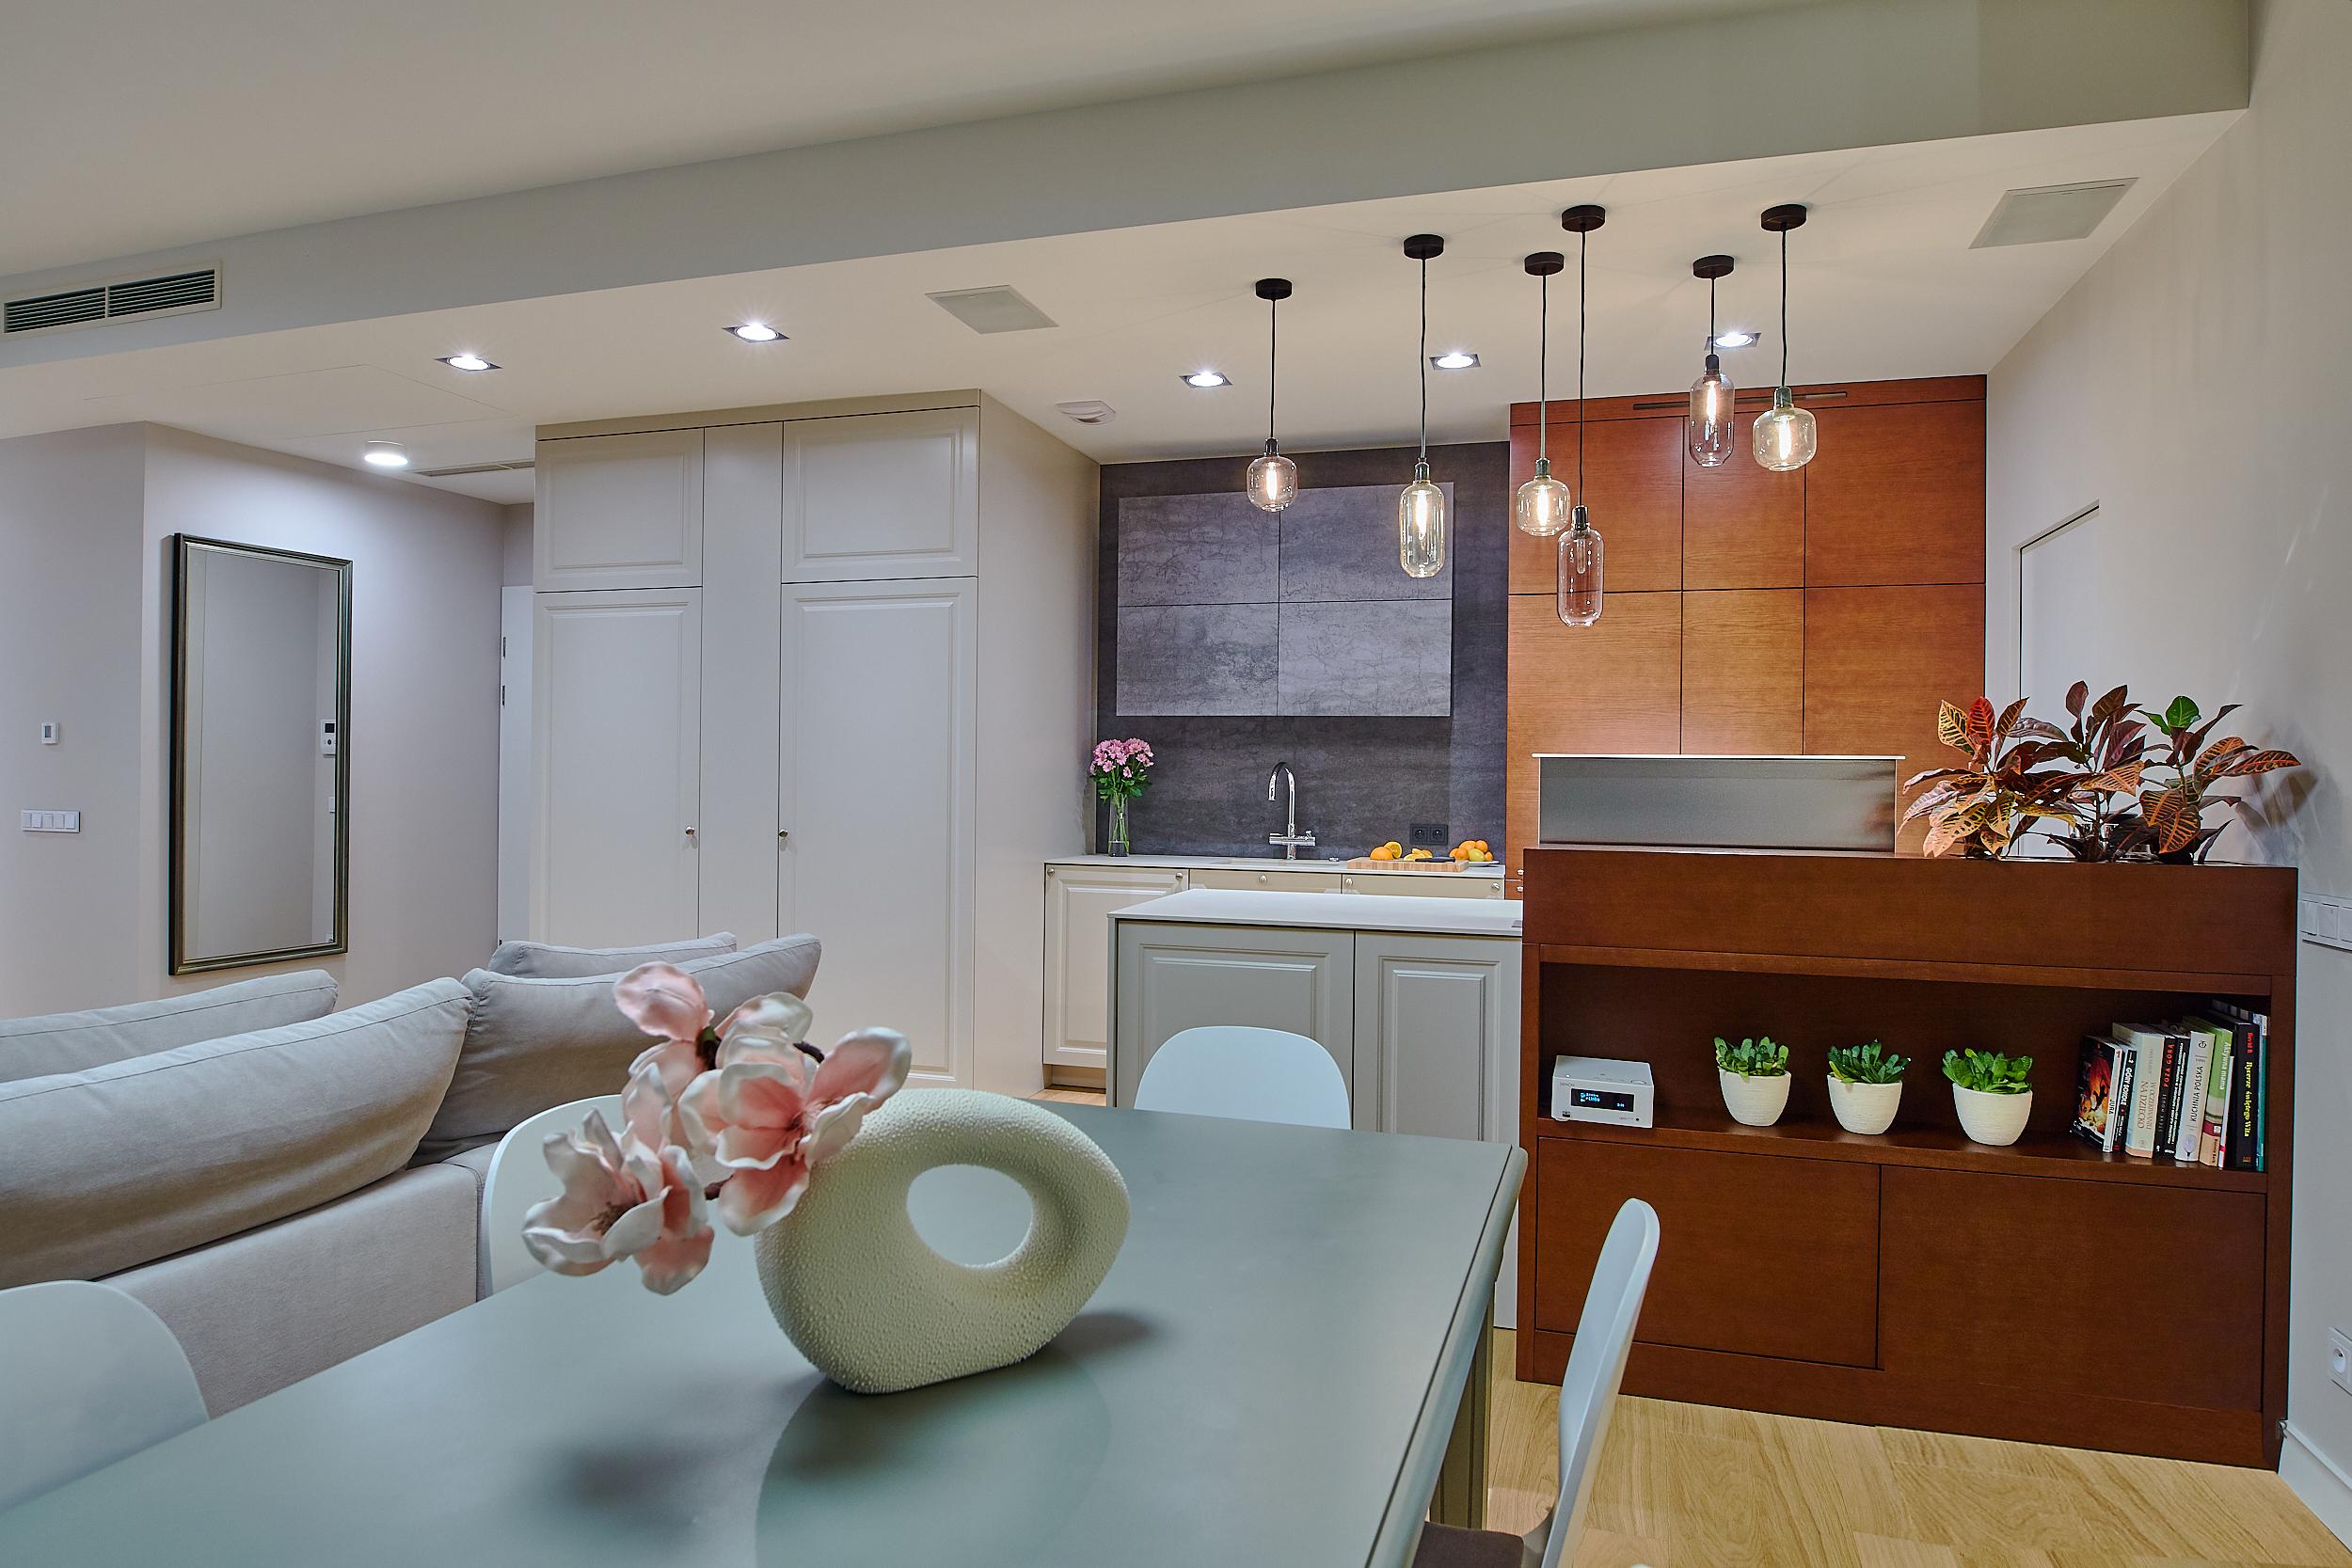 salon, apartament ovo, projekt wnętrz, architekt, jasne wnętrze, pastele, julia koczur, koru 11